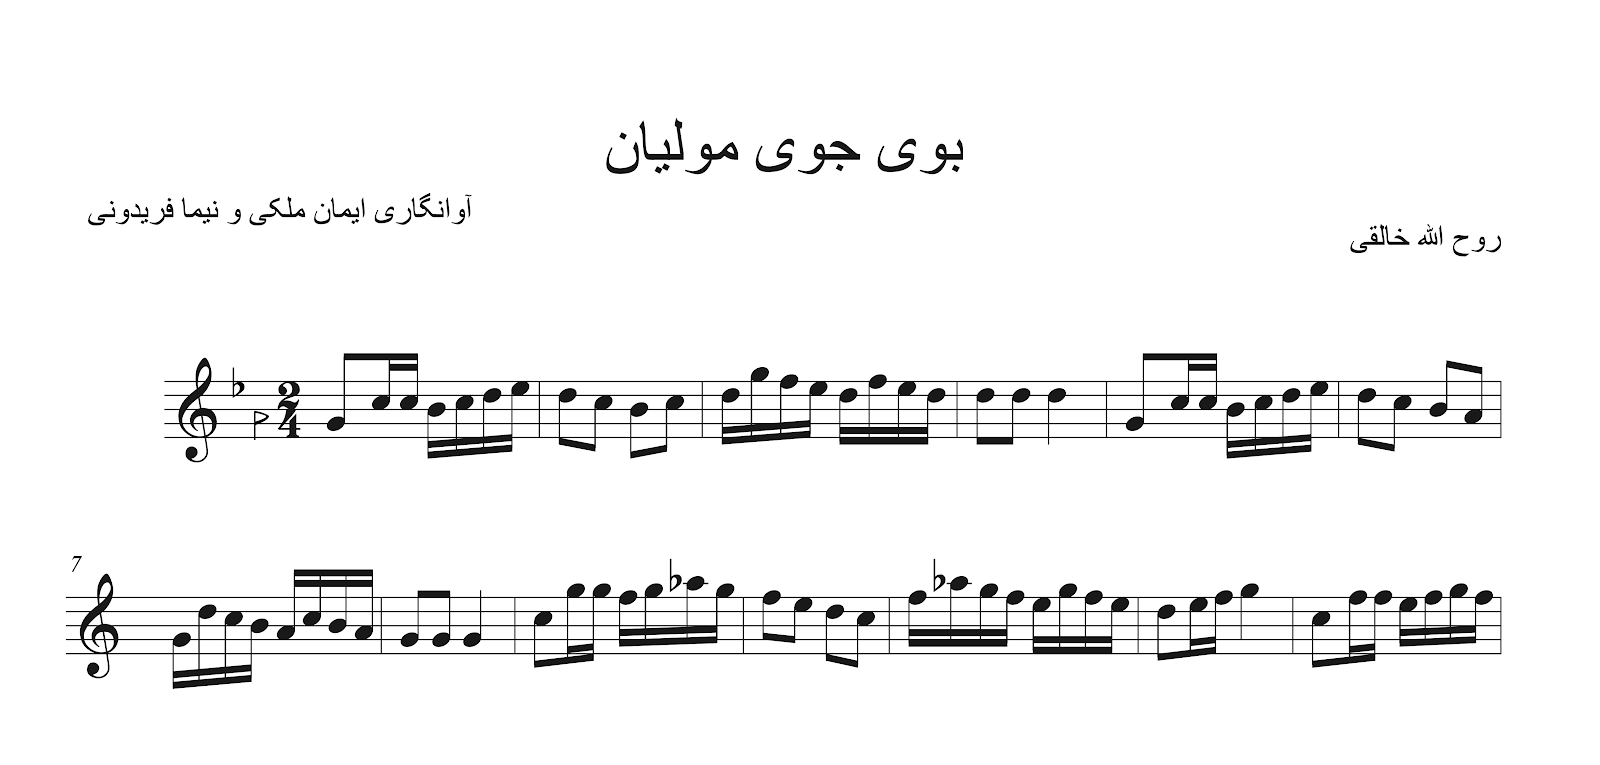 نت چنگ رودکی (بوی جوی مولیان) بیات اصفهان روحالله خالقی غلامحسین بنان رودکی